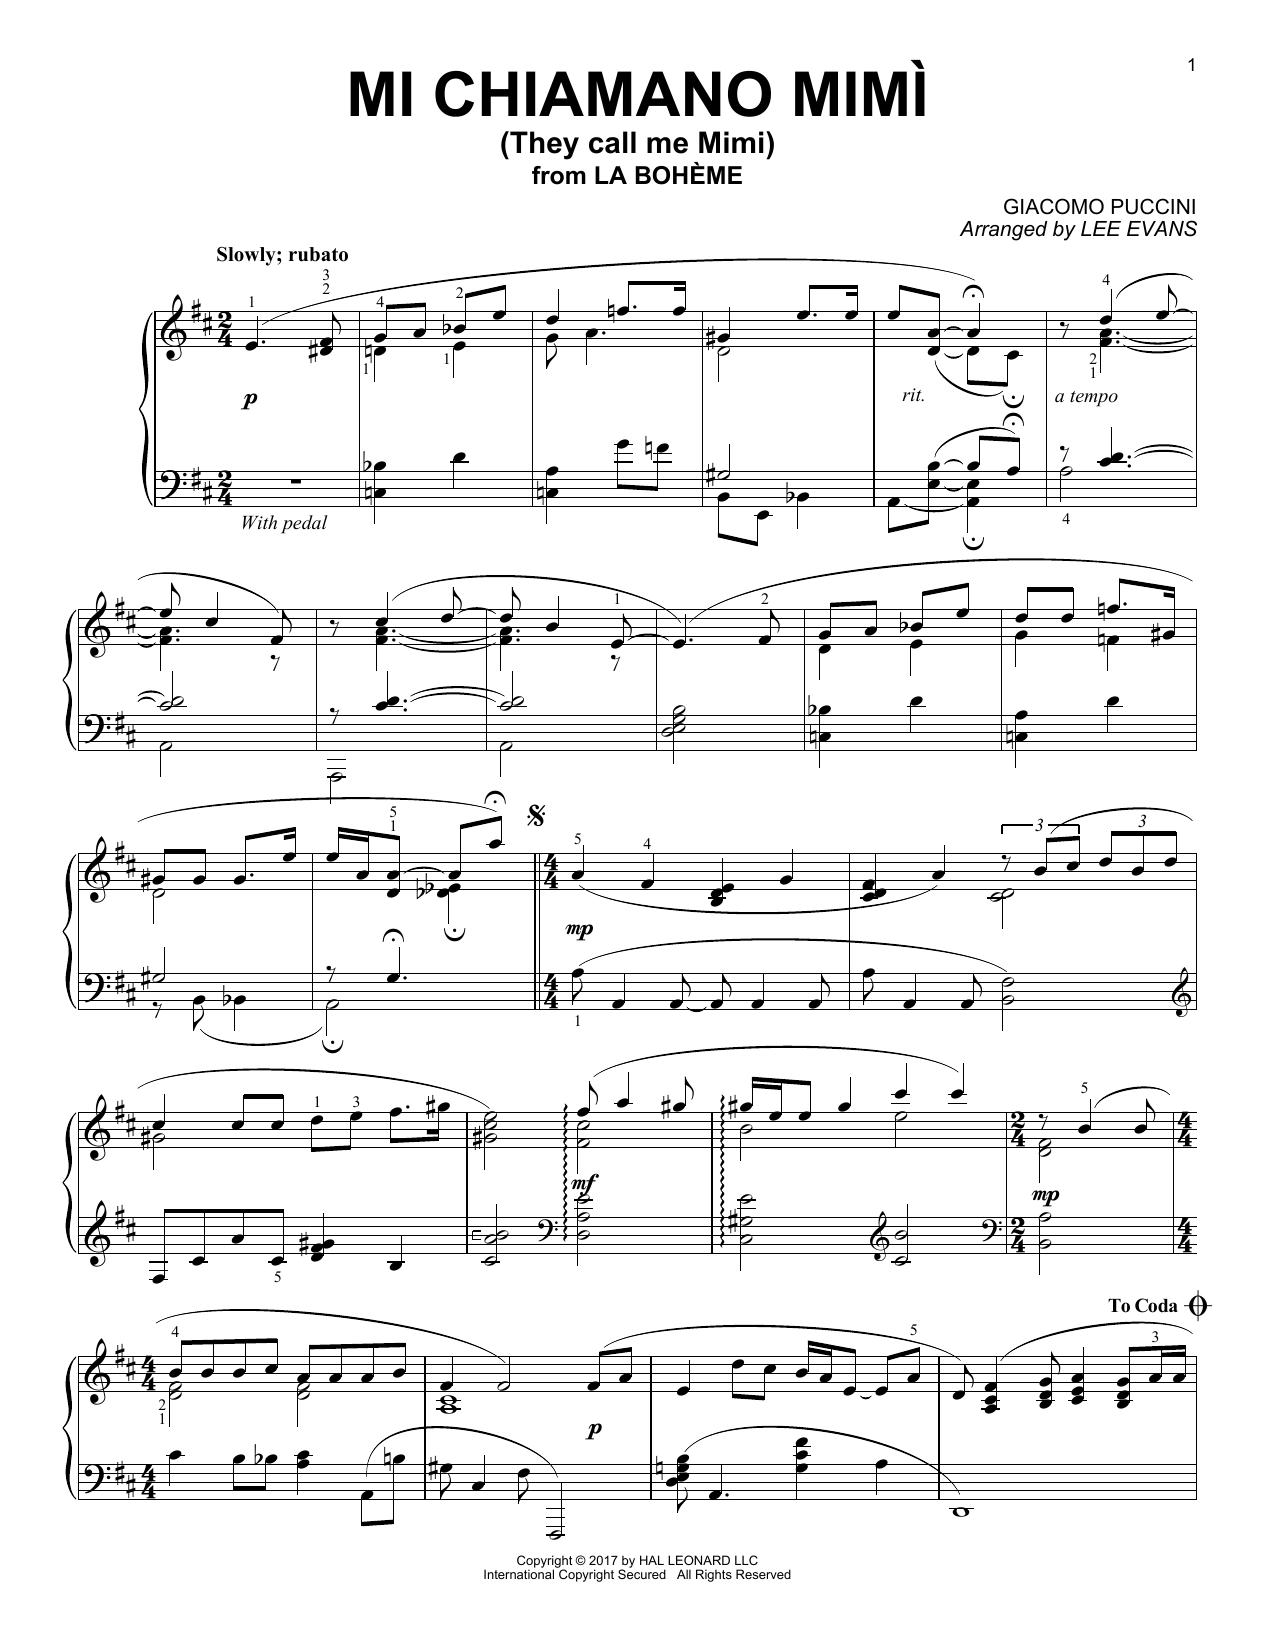 Lee Evans Me Chiamano Mimi sheet music notes and chords. Download Printable PDF.